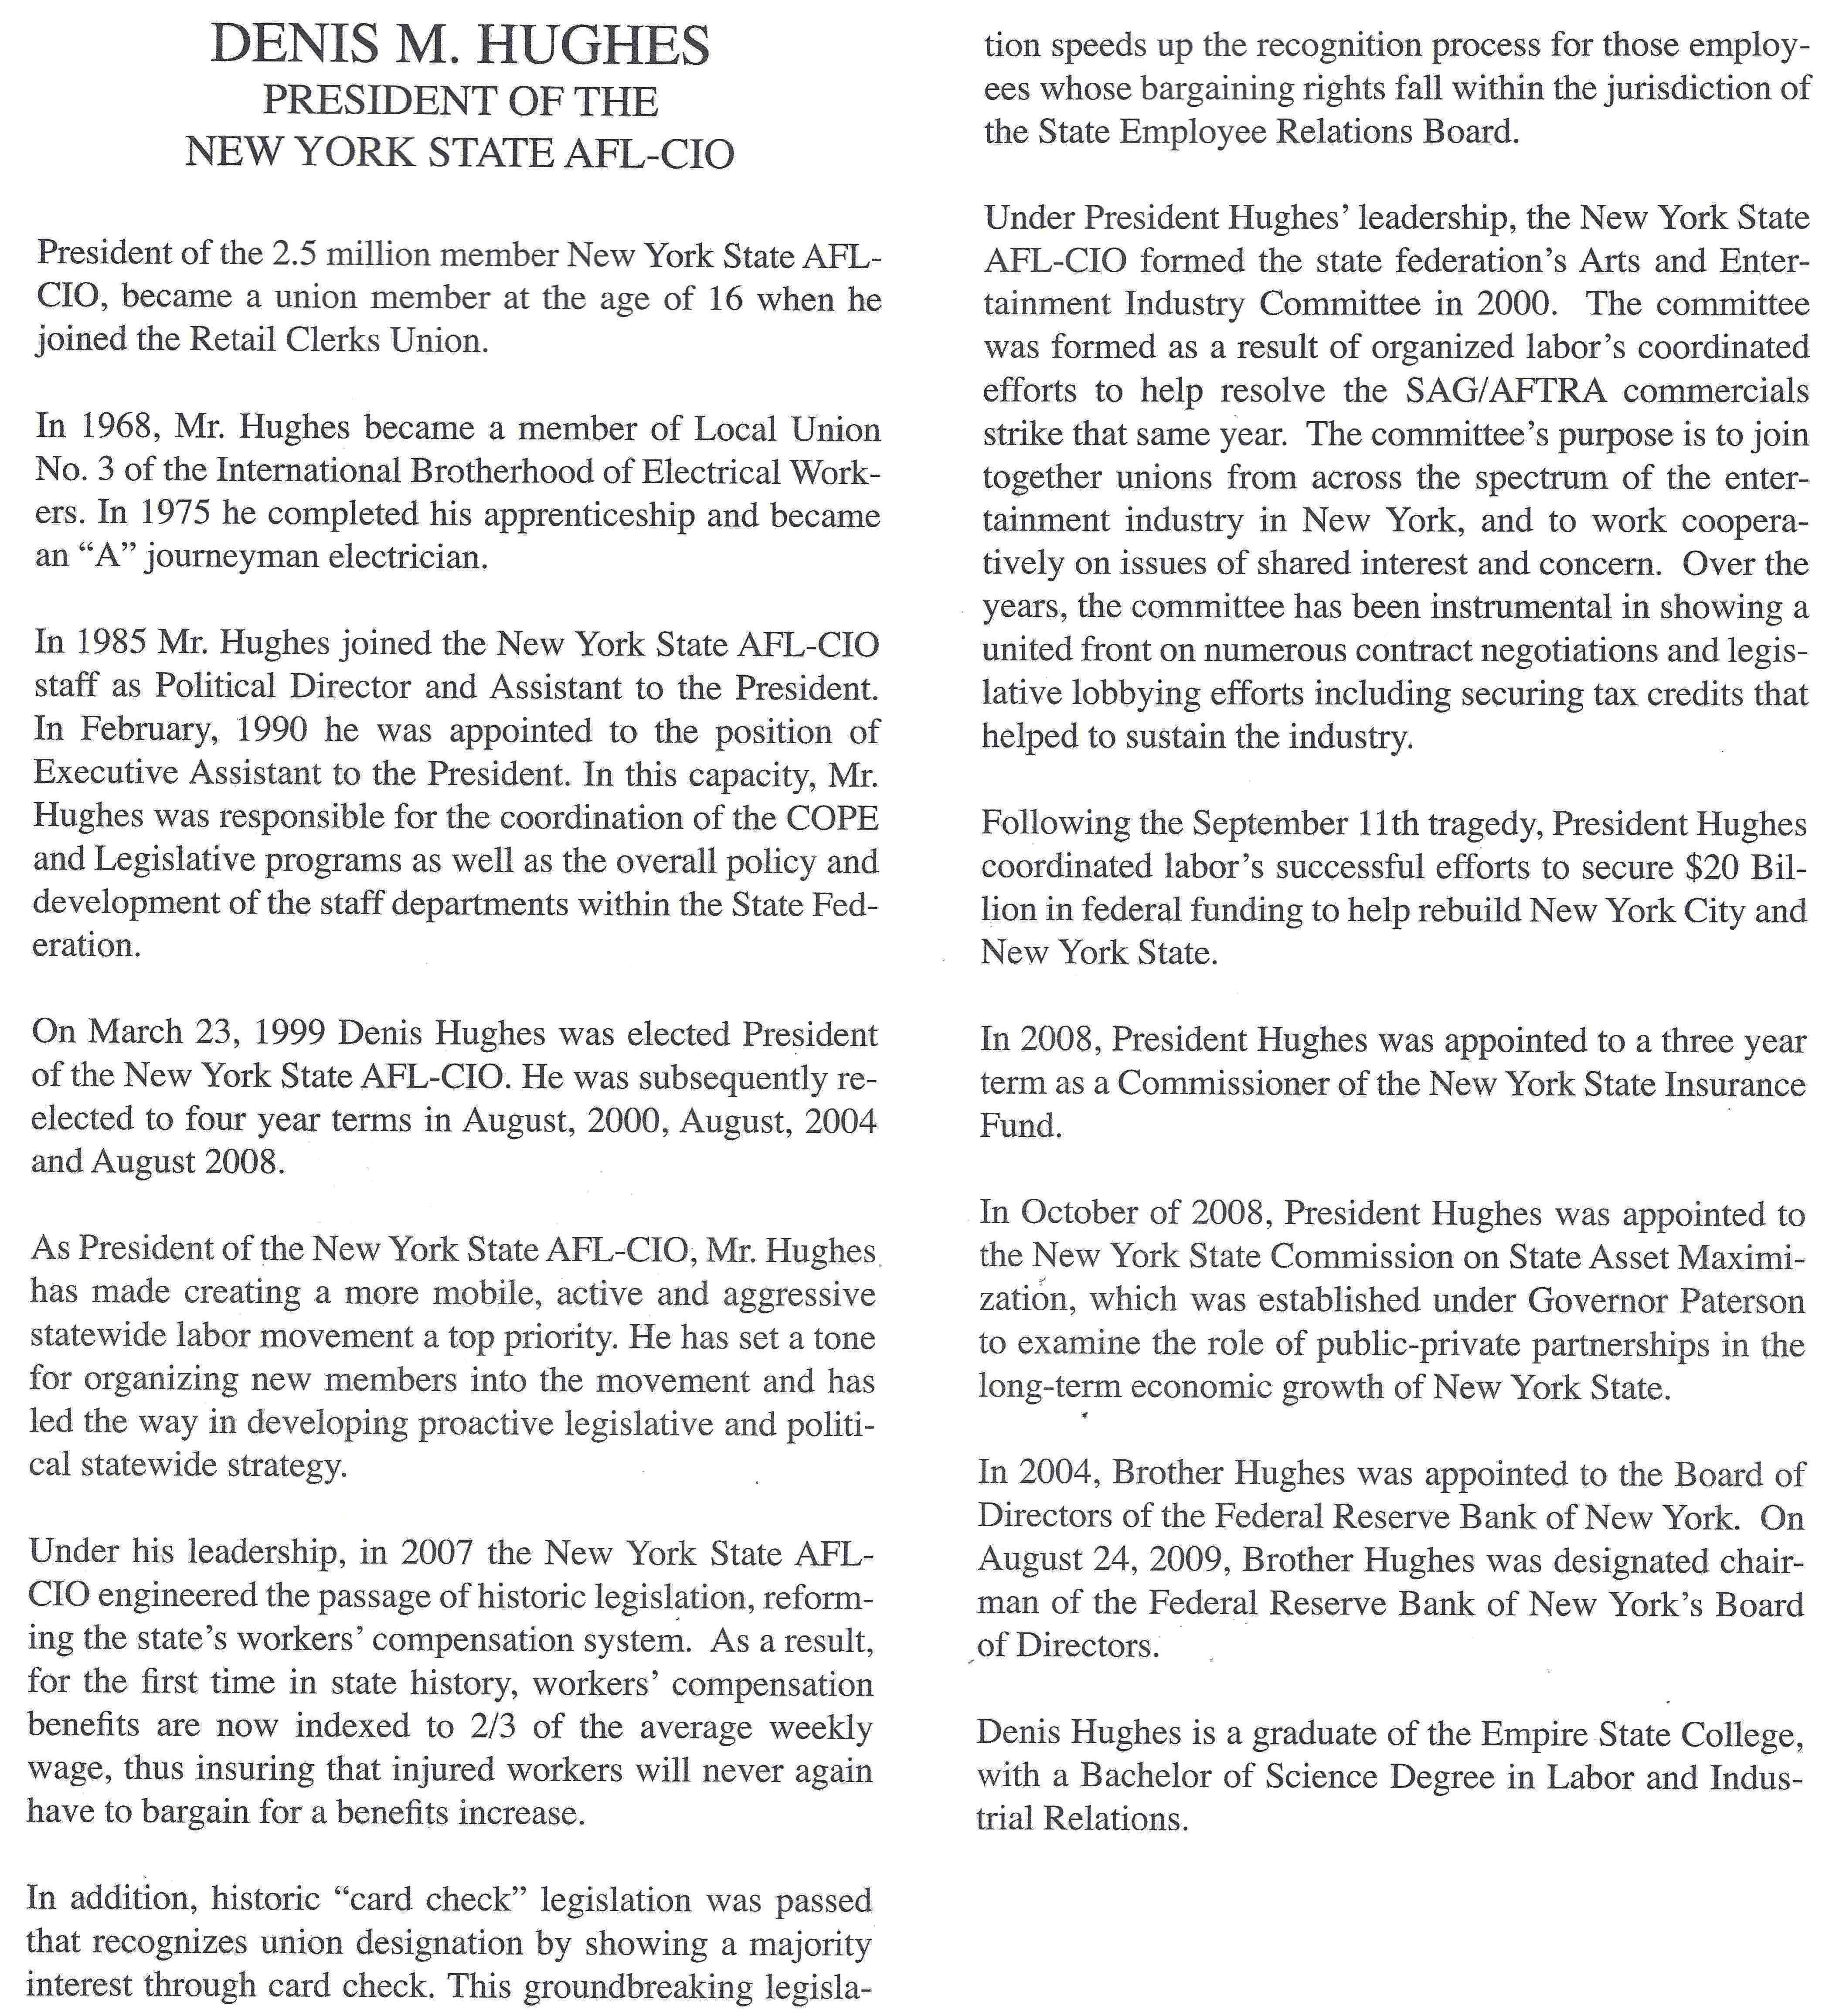 mcmanus 10-25-10 page 2.jpg